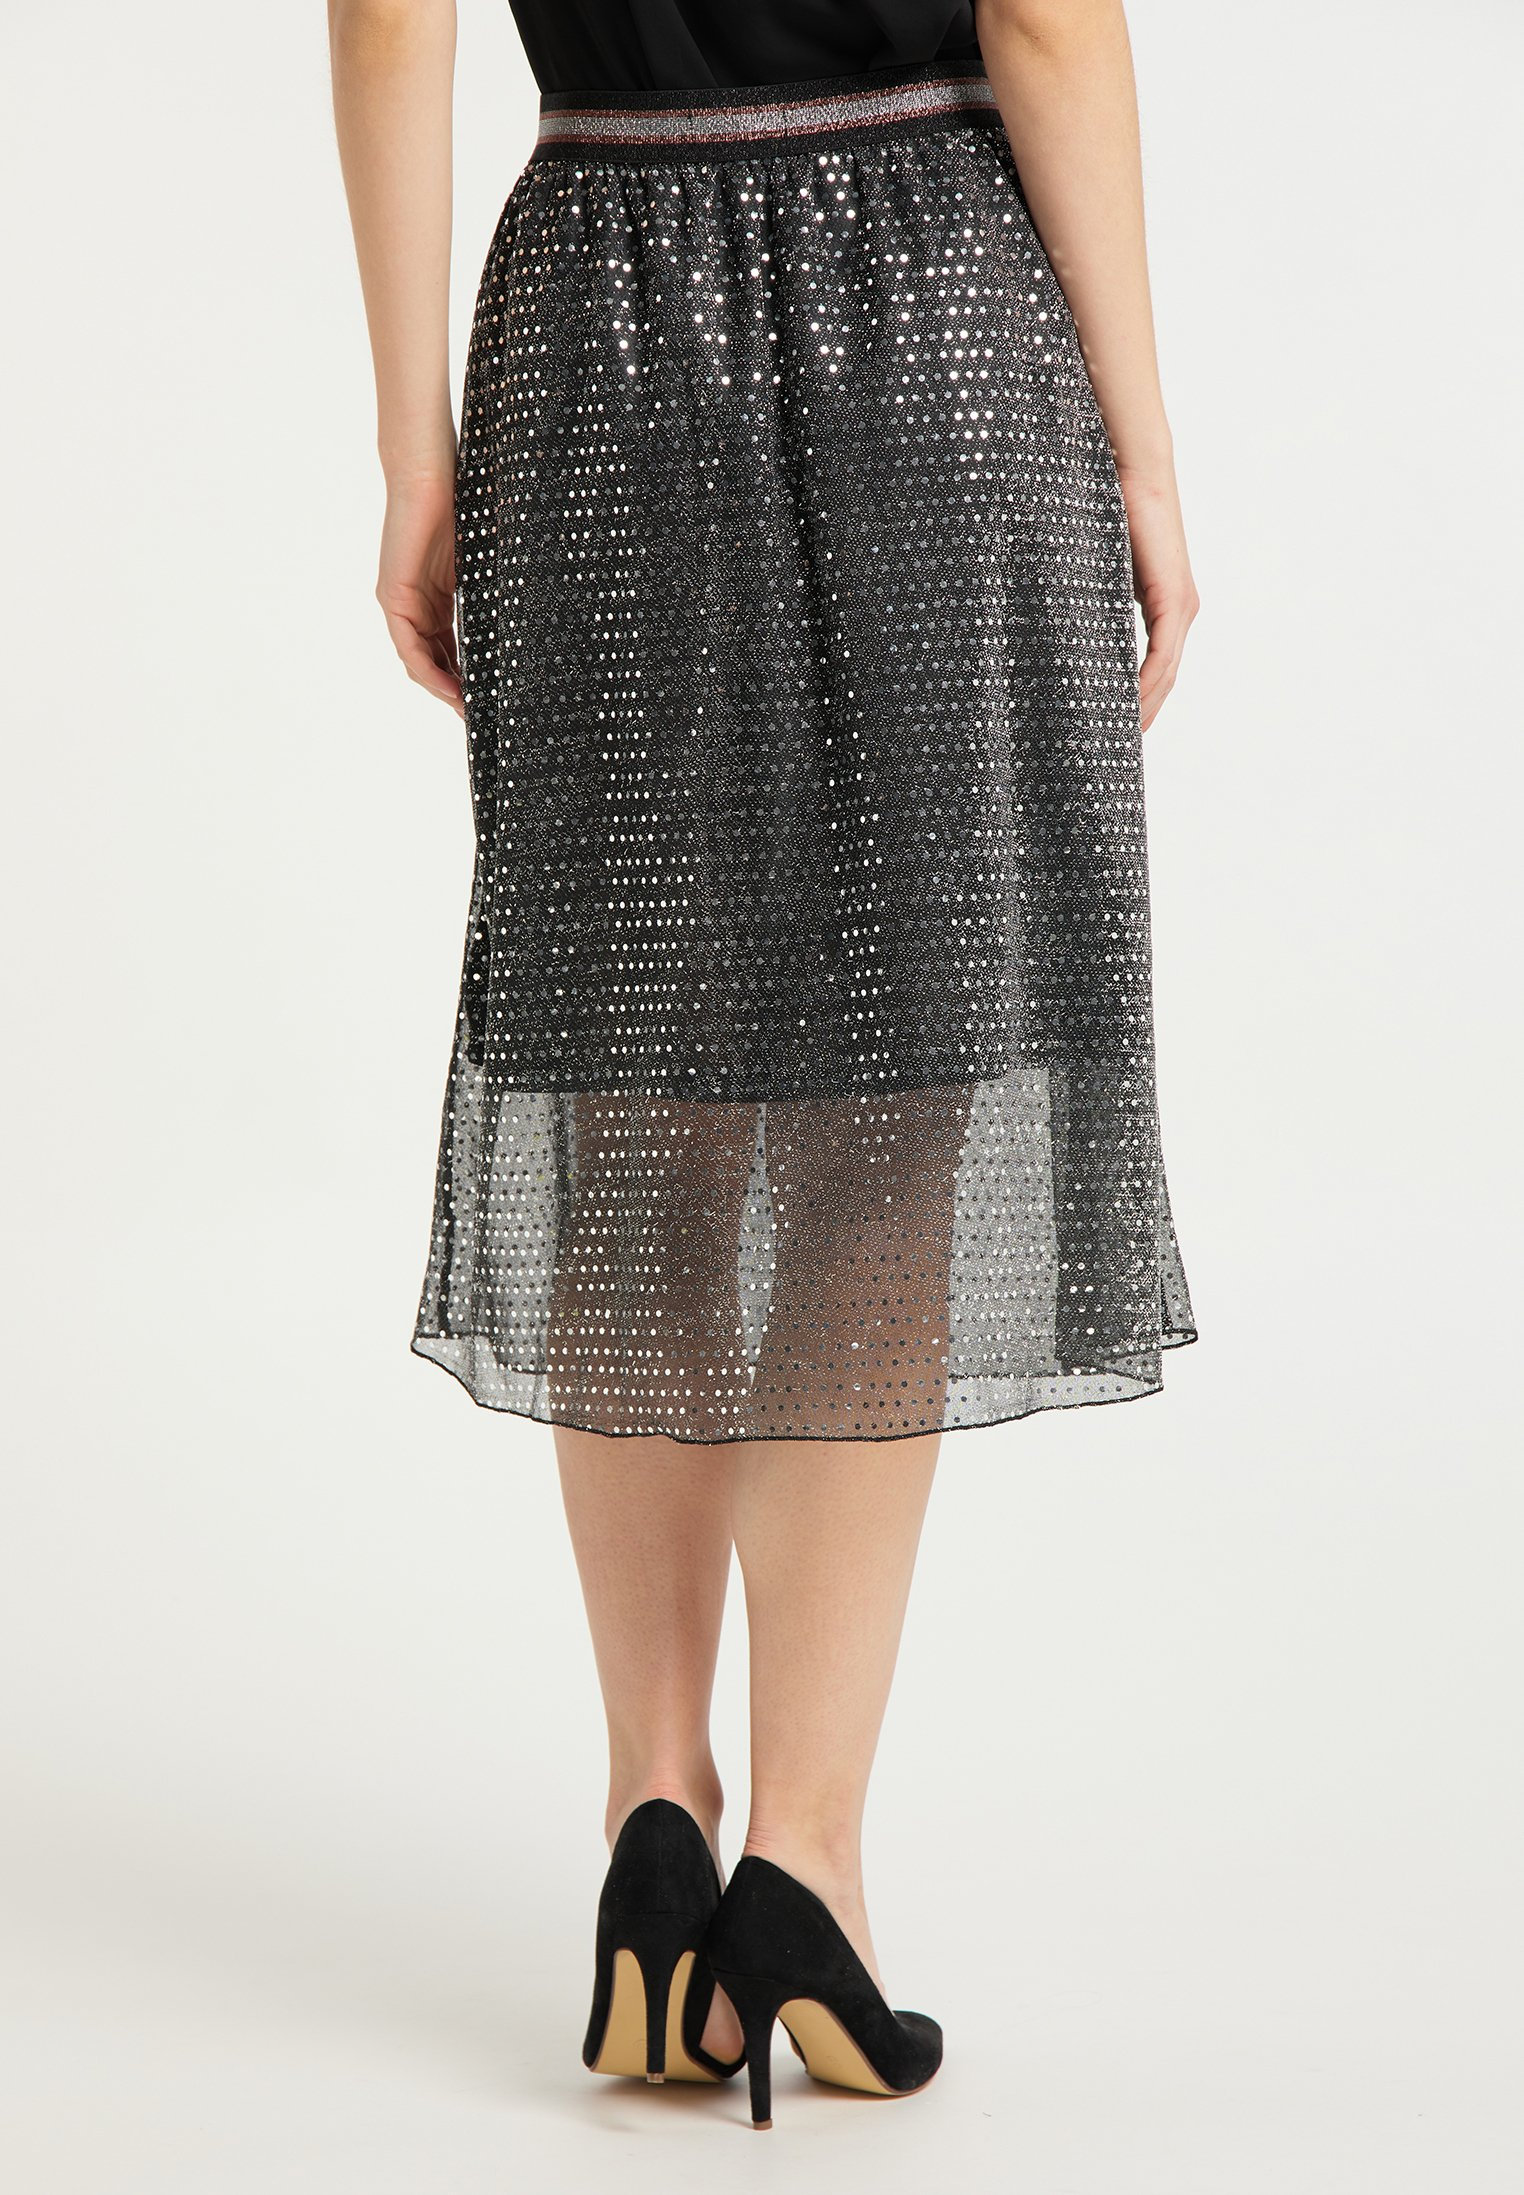 Fast Express Women's Clothing faina MIDIROCK Pleated skirt schwarz silber qFf5hOczG